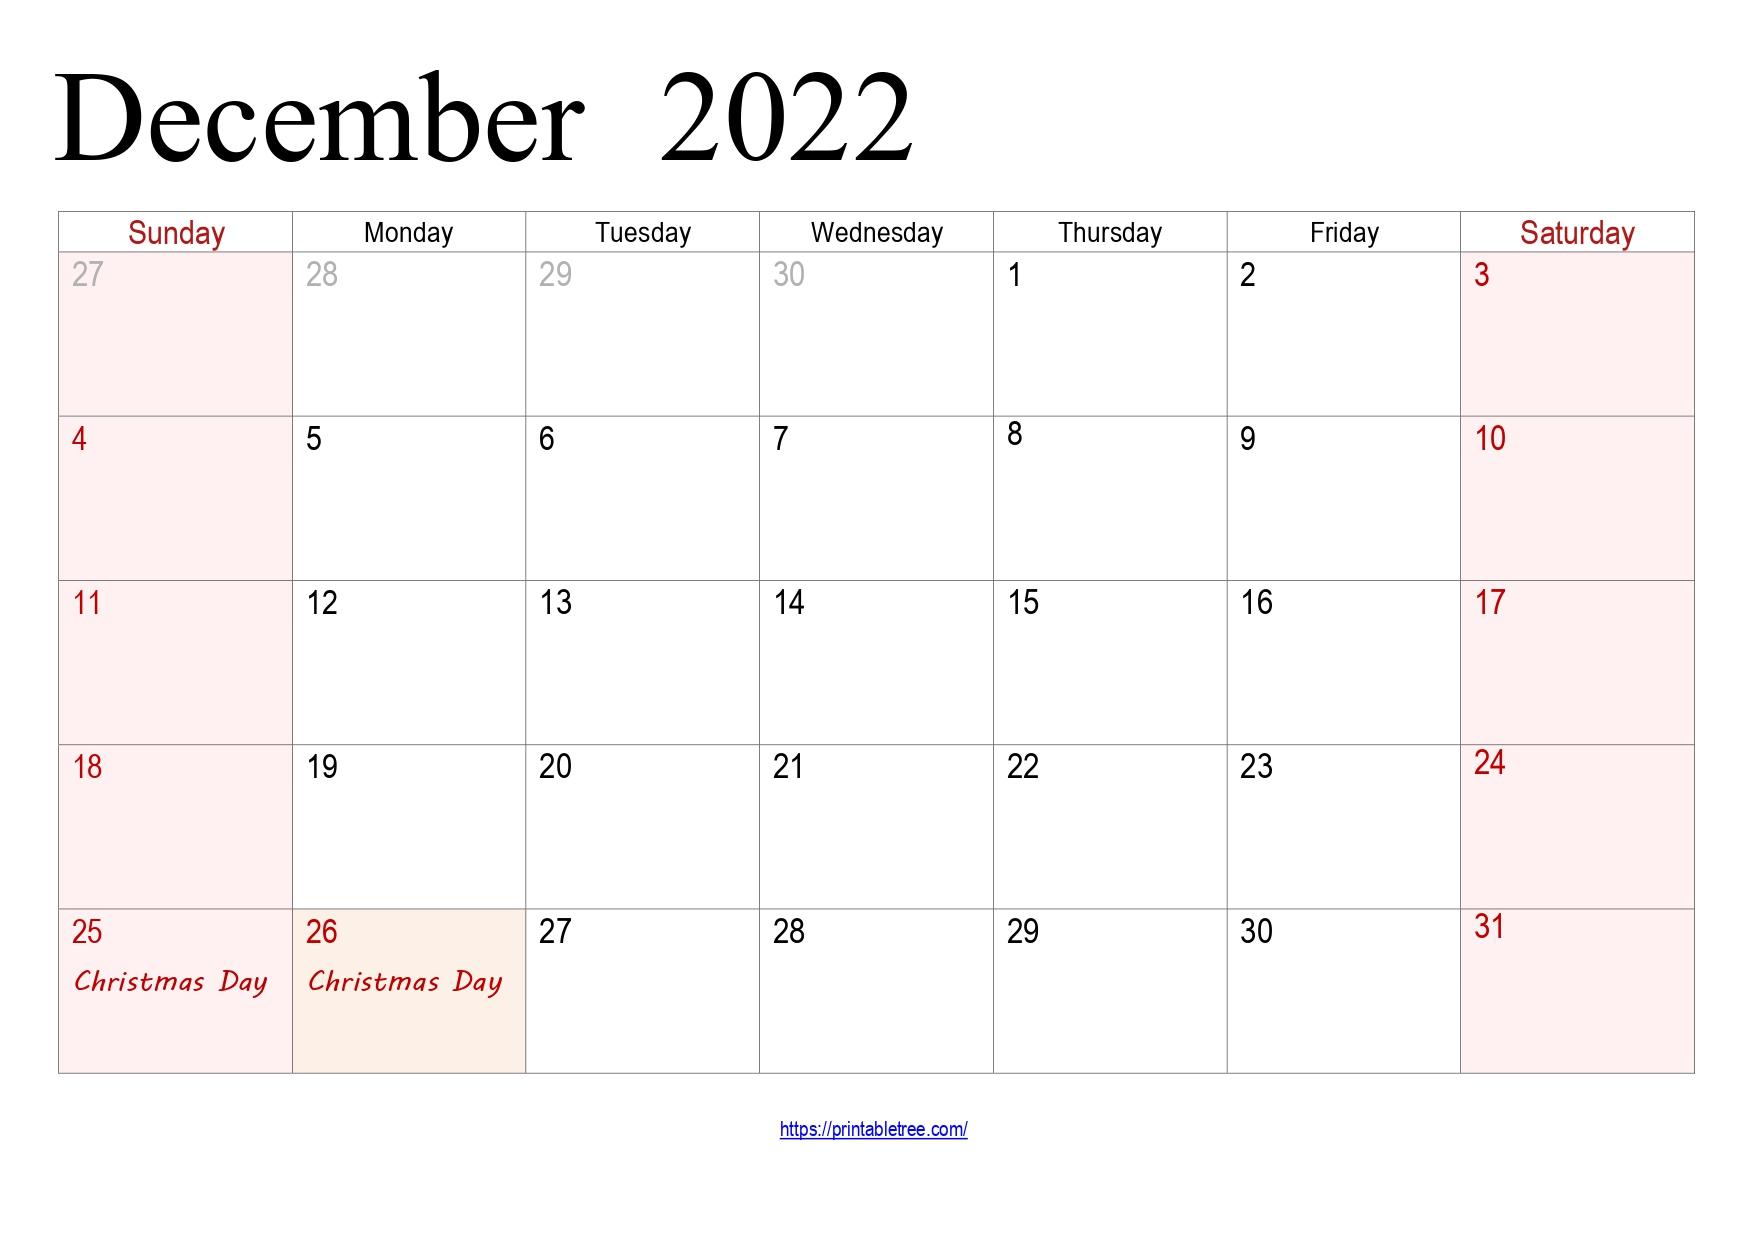 December Calendar 2022 with holidays